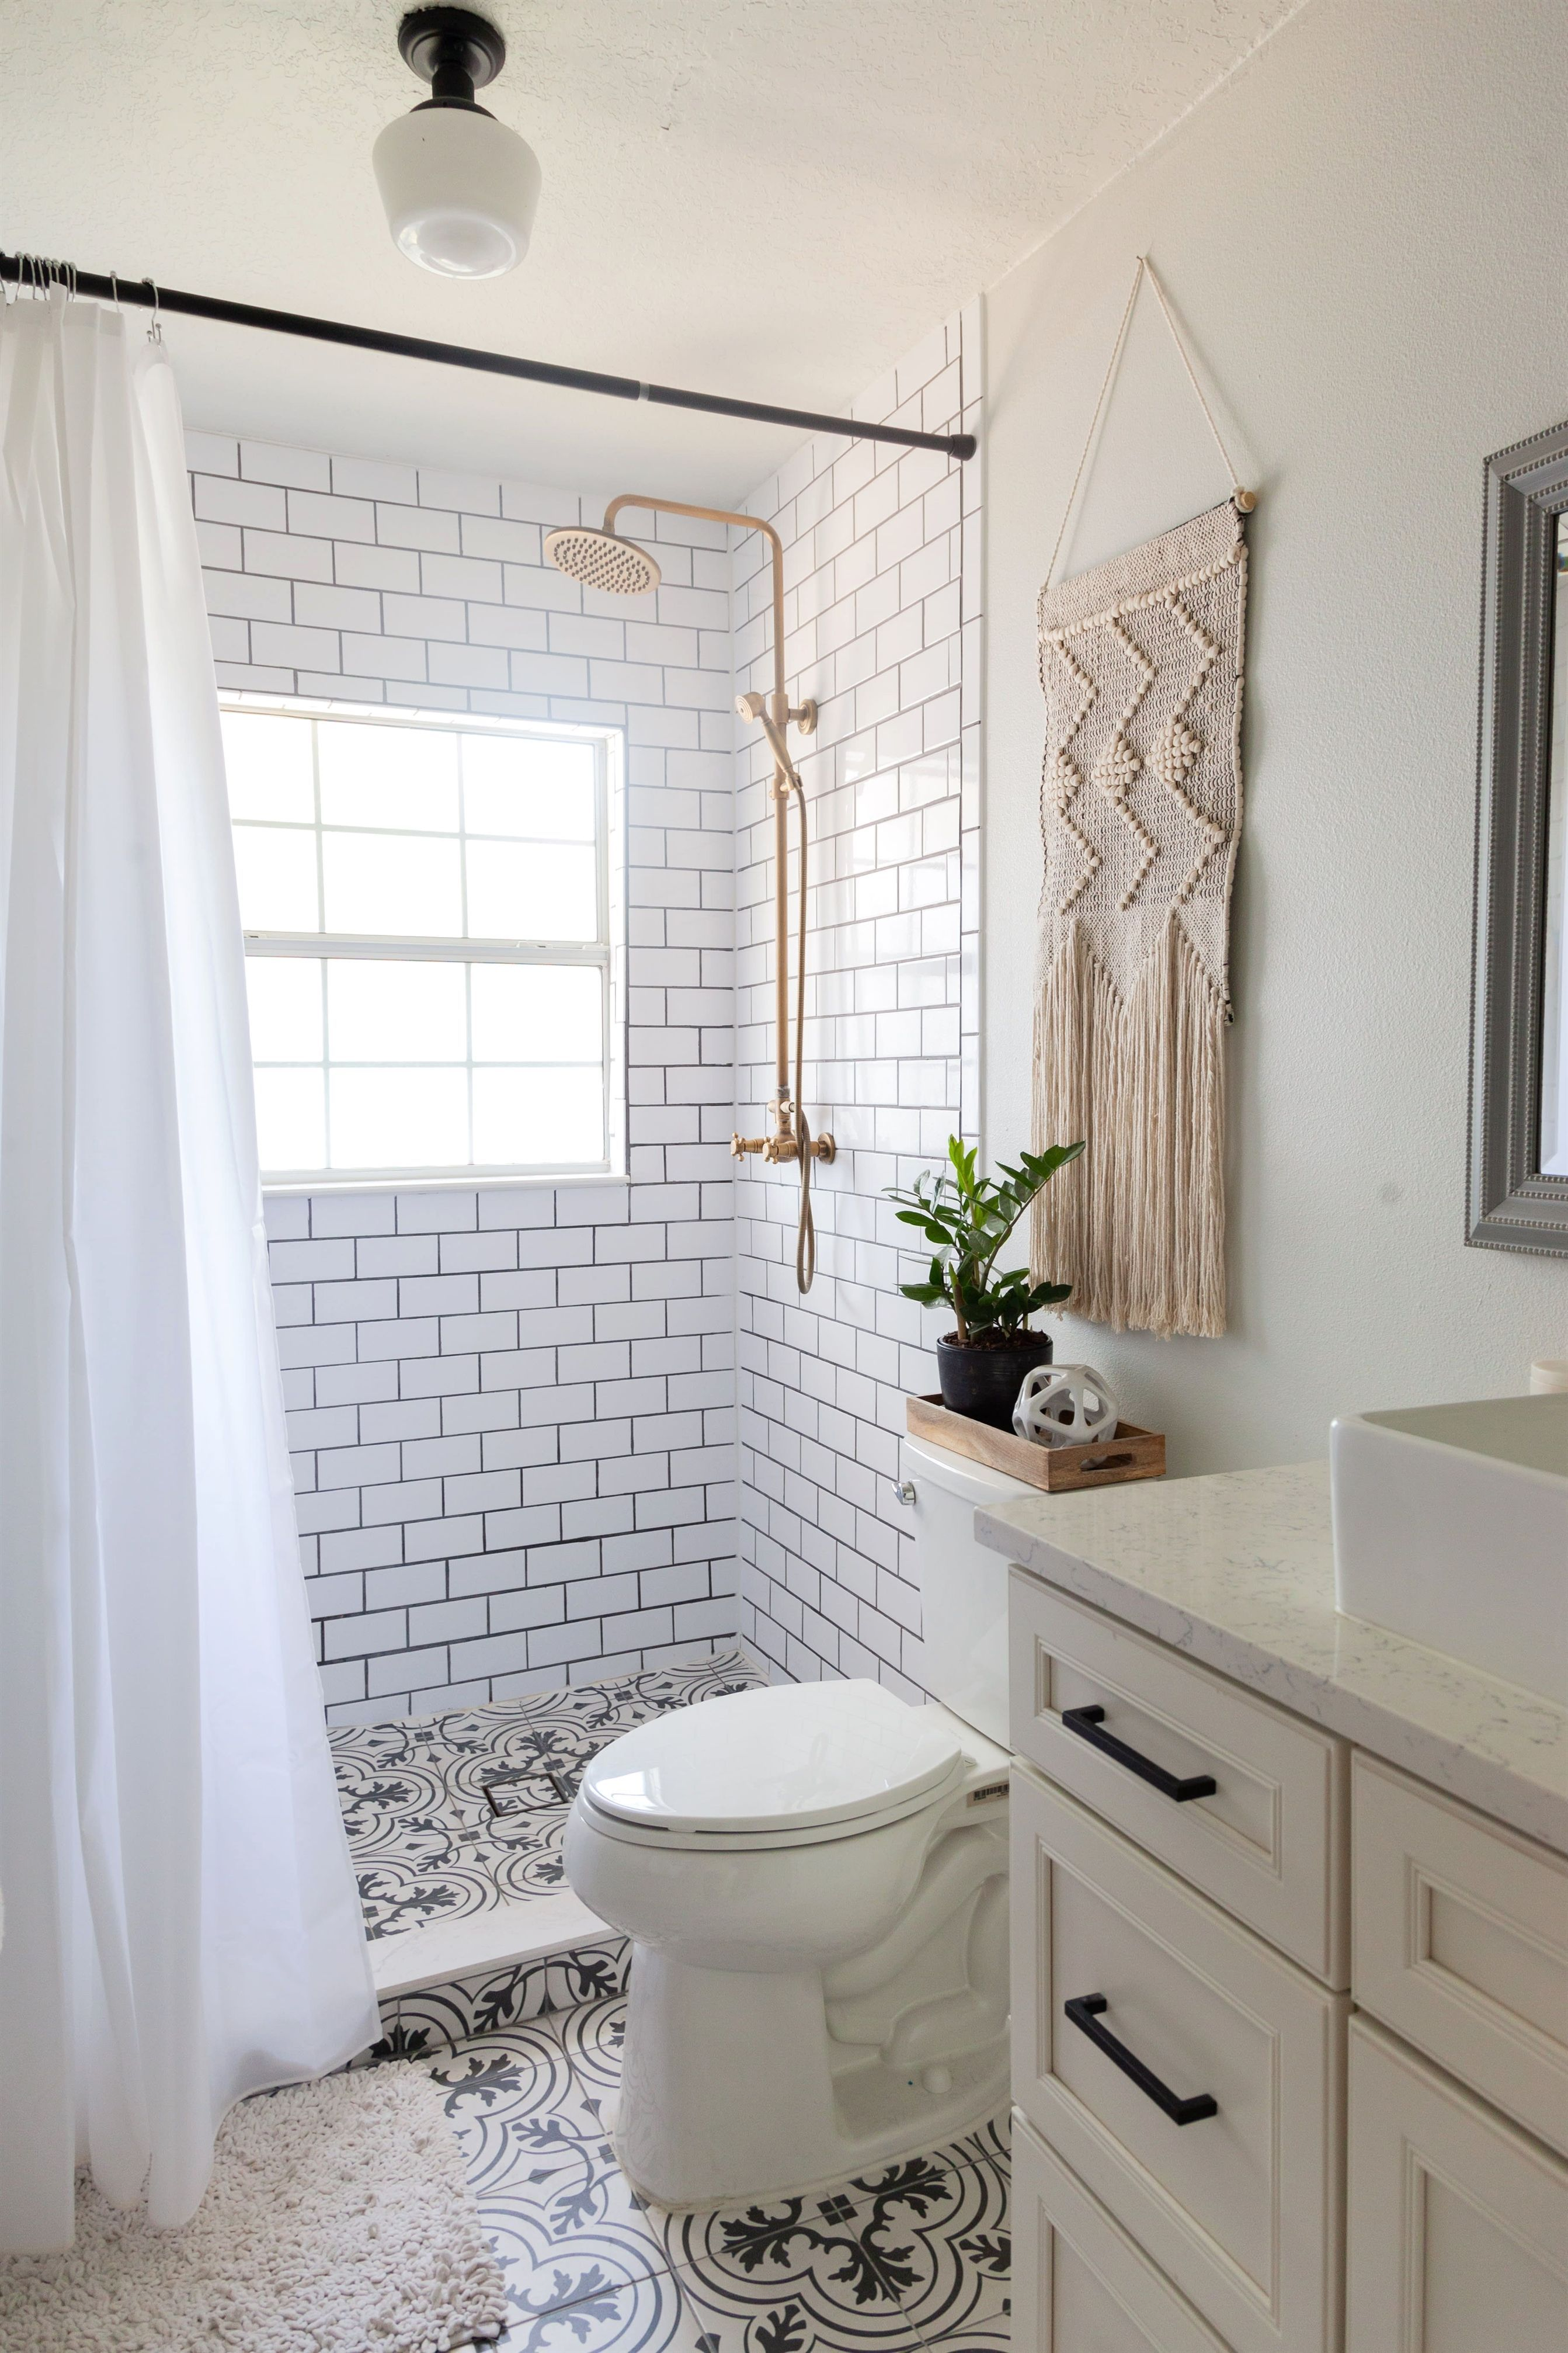 The Bathroom Tile Was Found At Overstock Bathroom Renovation Ideas Smallbathroom Small Bathroom Renovations Bathroom Design Small Minimalist Small Bathrooms